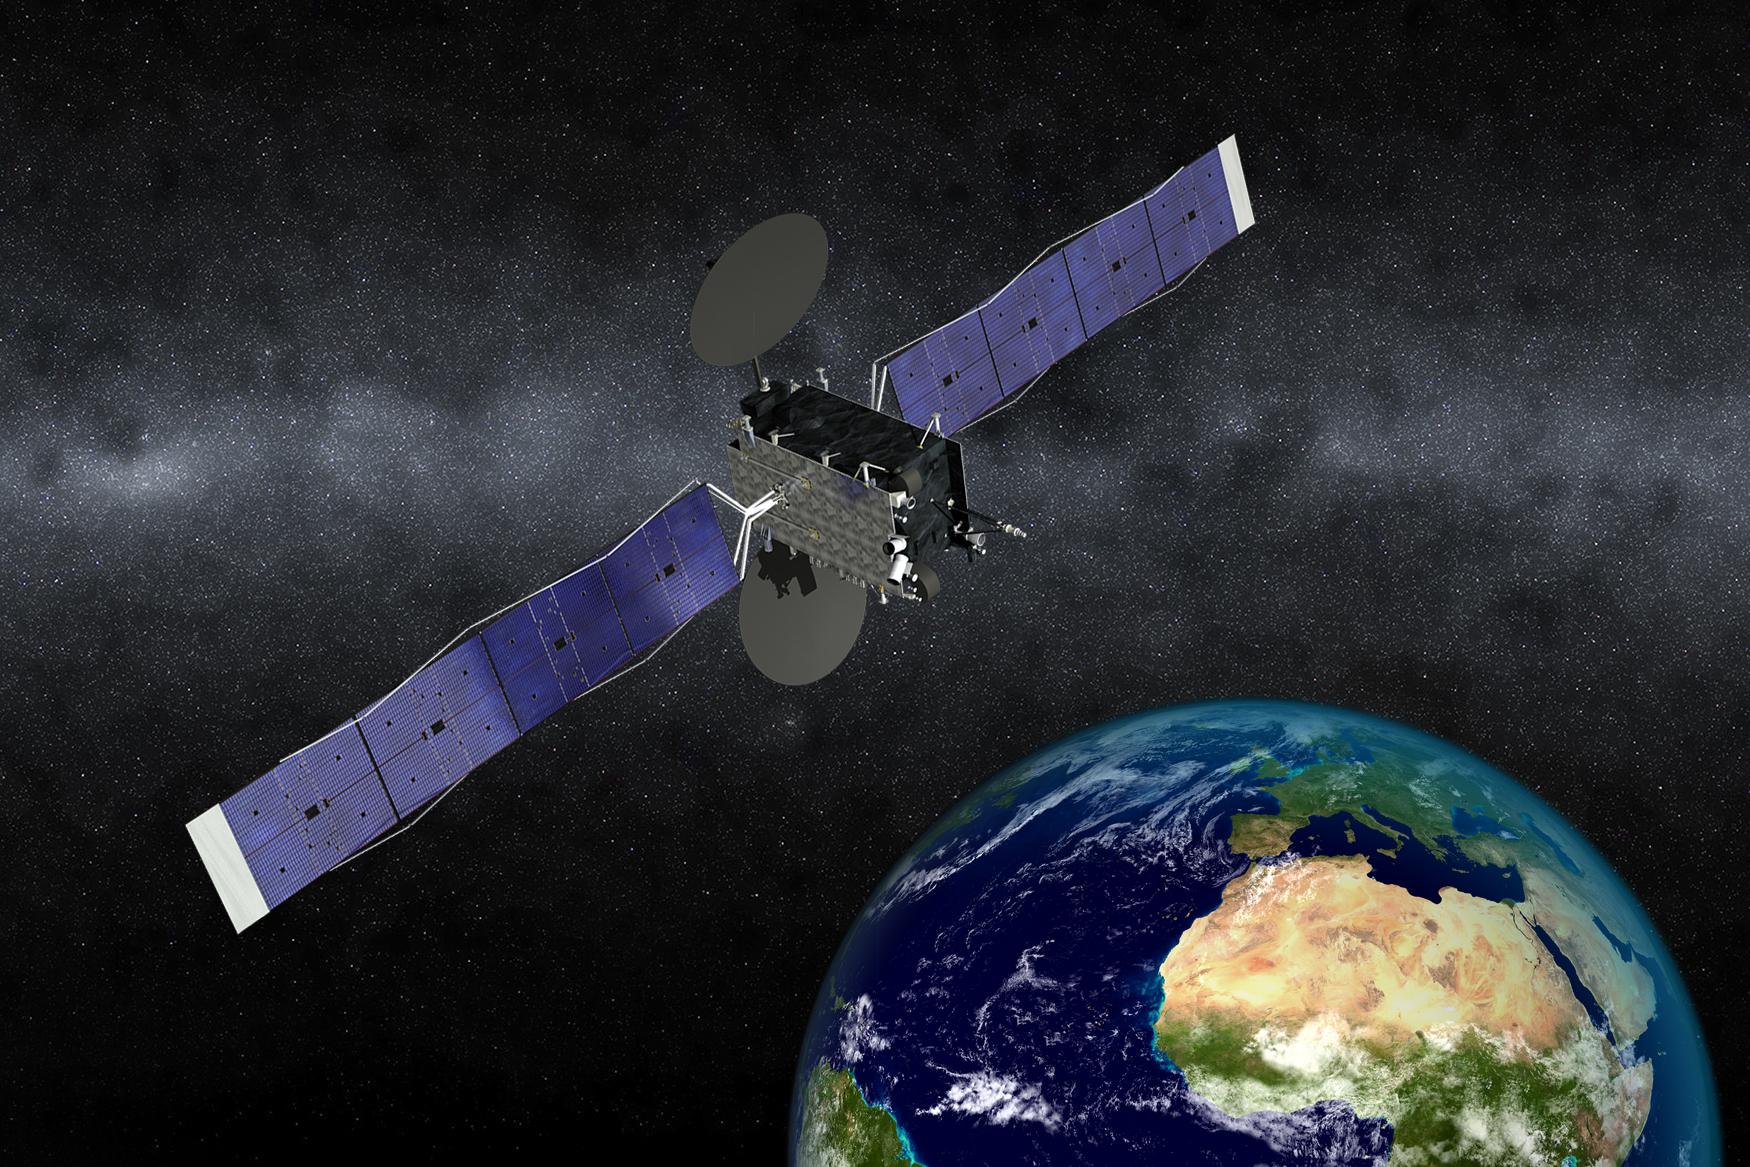 Artist's concept of the EUTELSAT 5 West B satellite Credit: Orbital ATK (Photo: Business Wire)